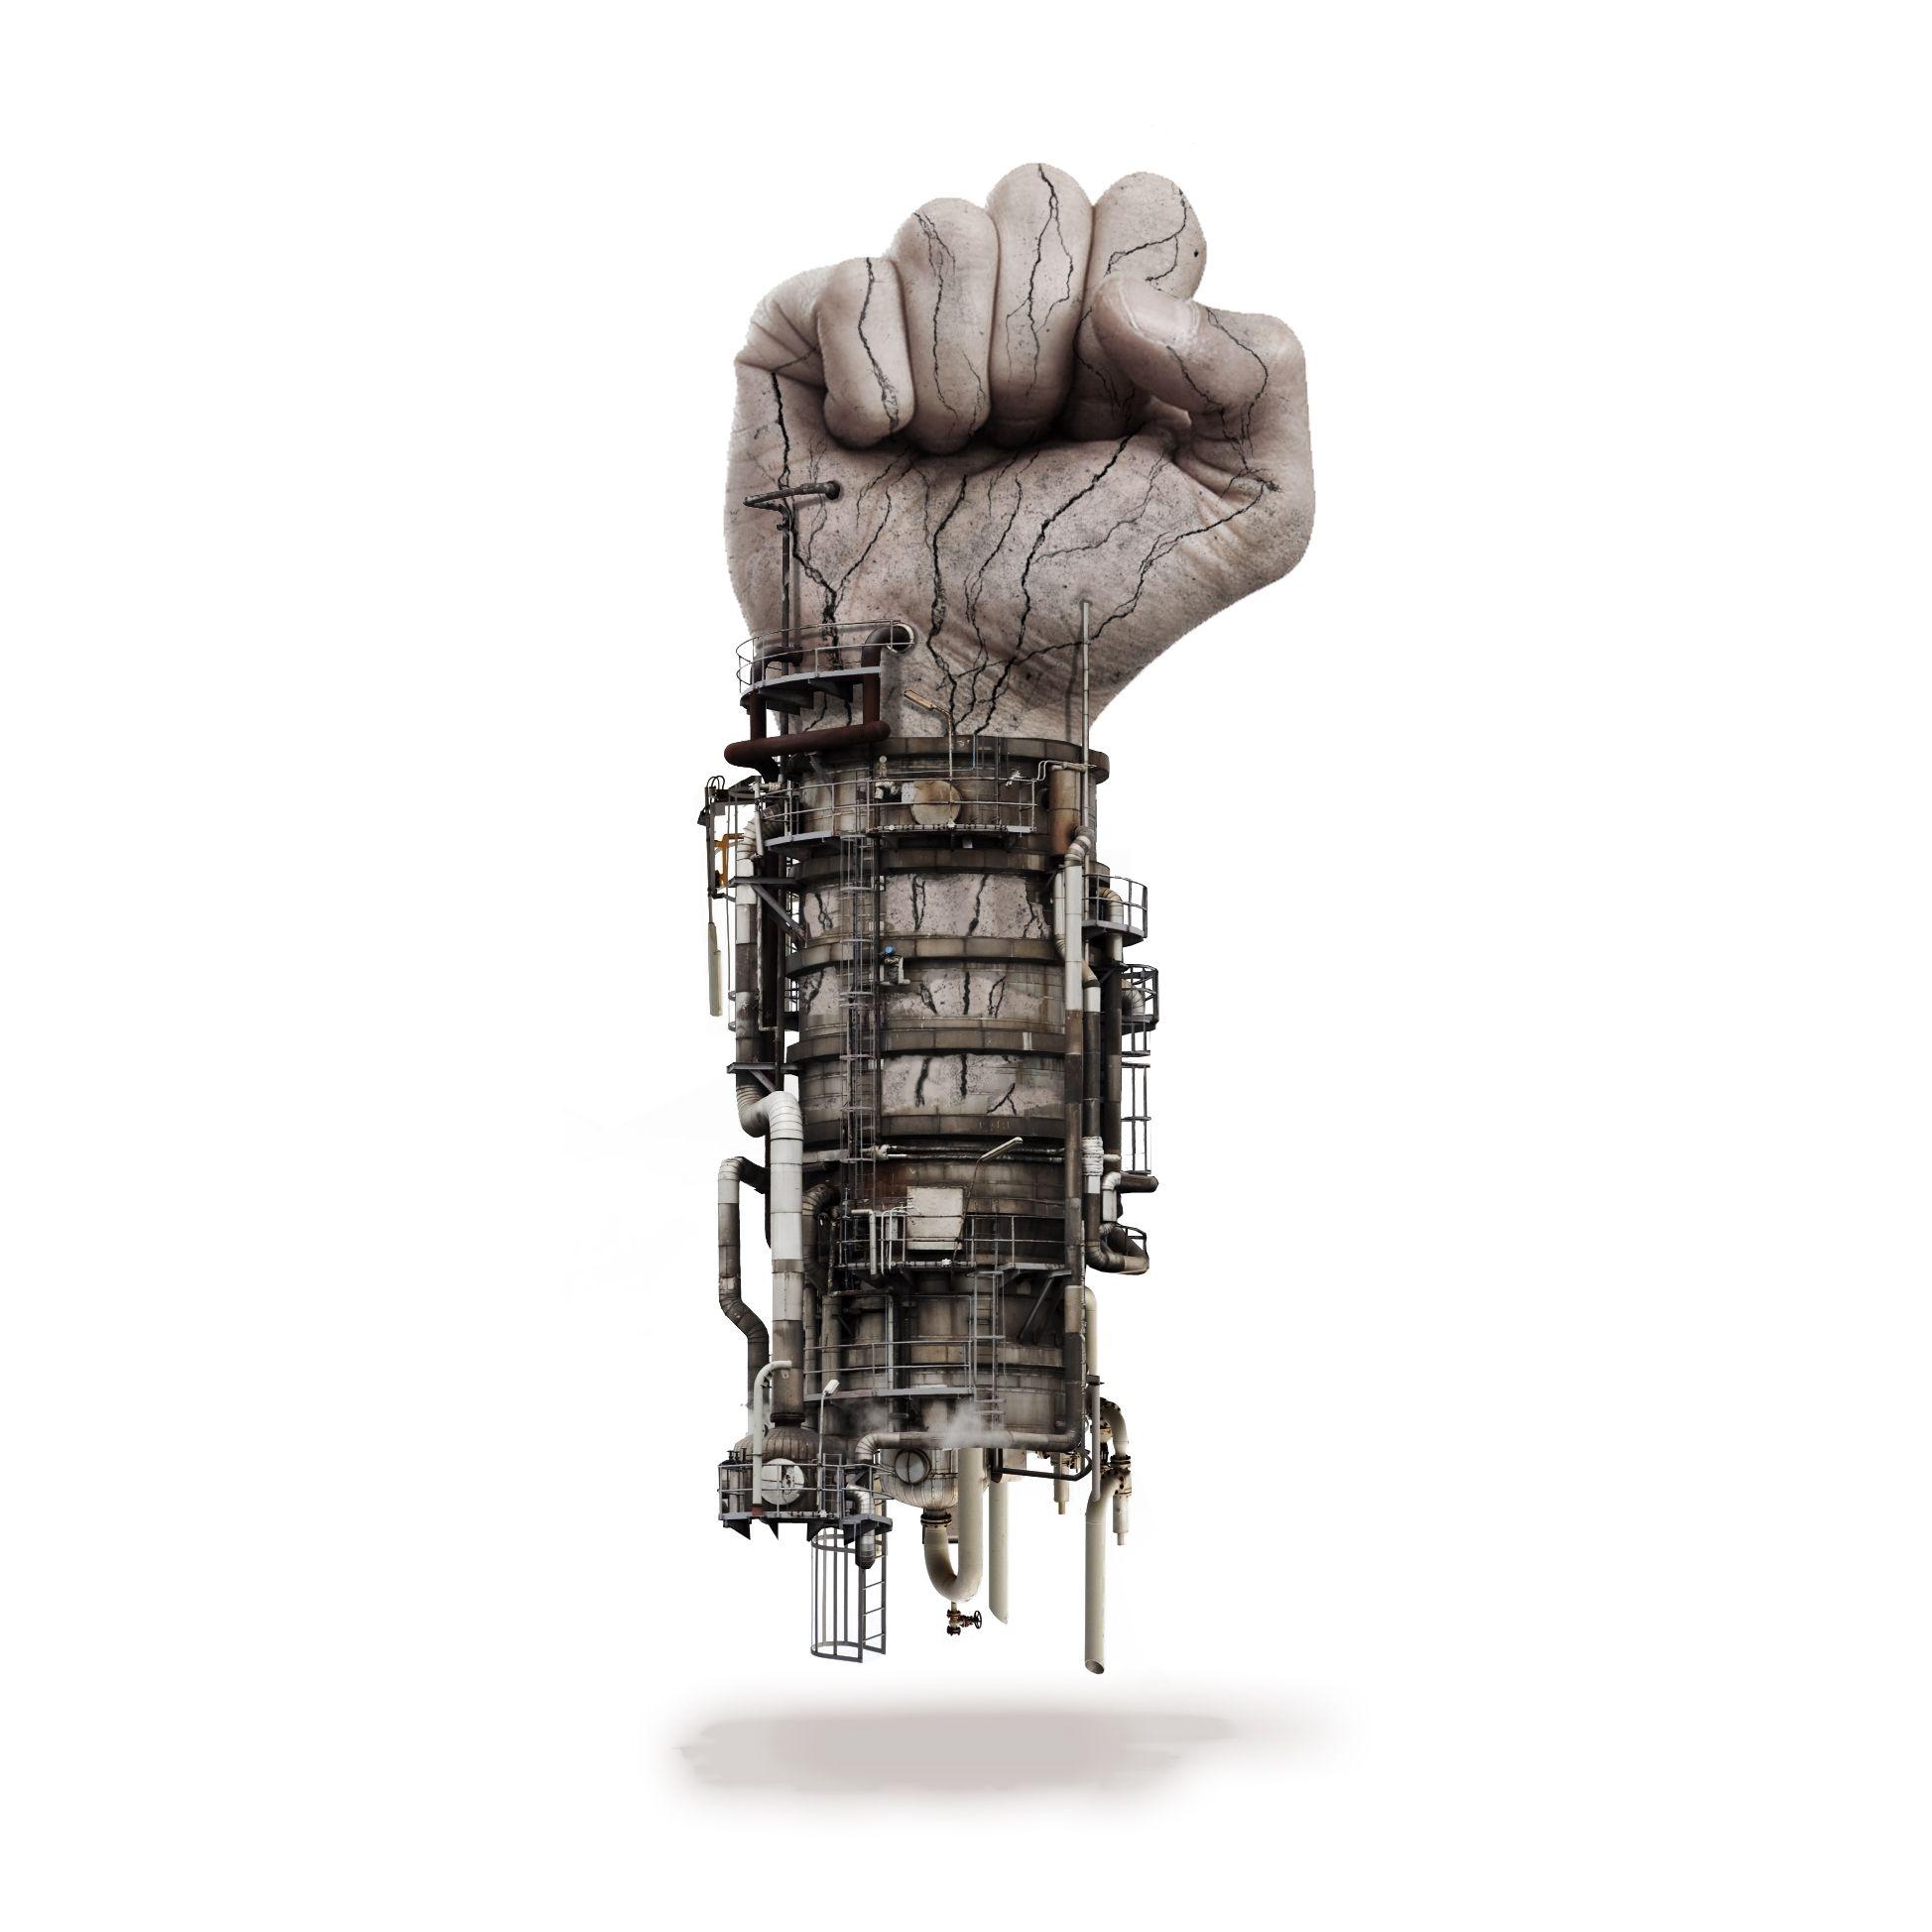 Robotic hand png images psds for download